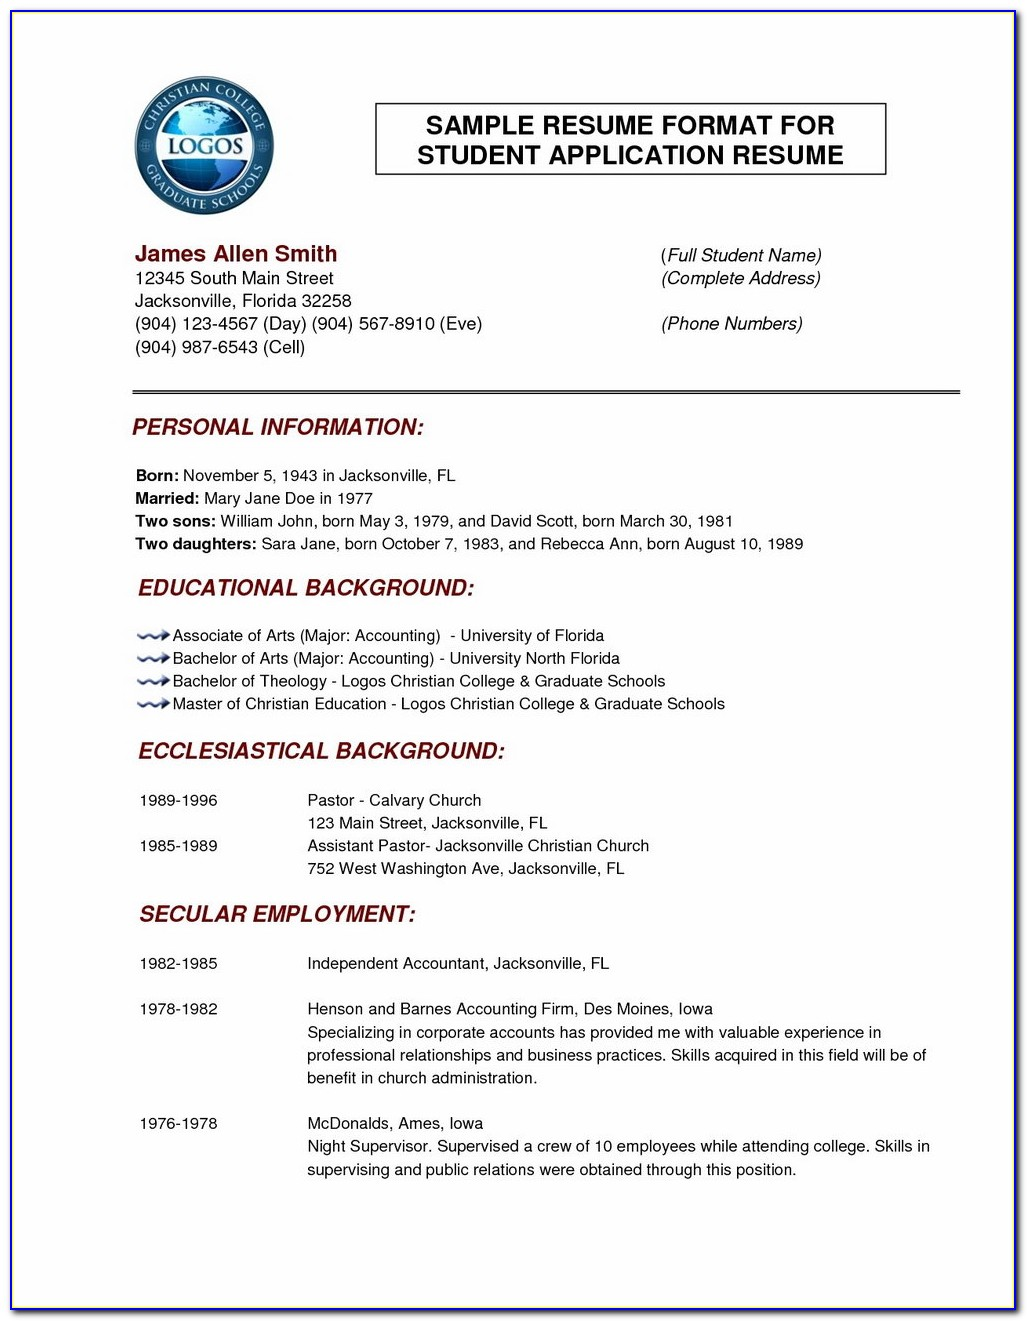 Normal Resume Format Download